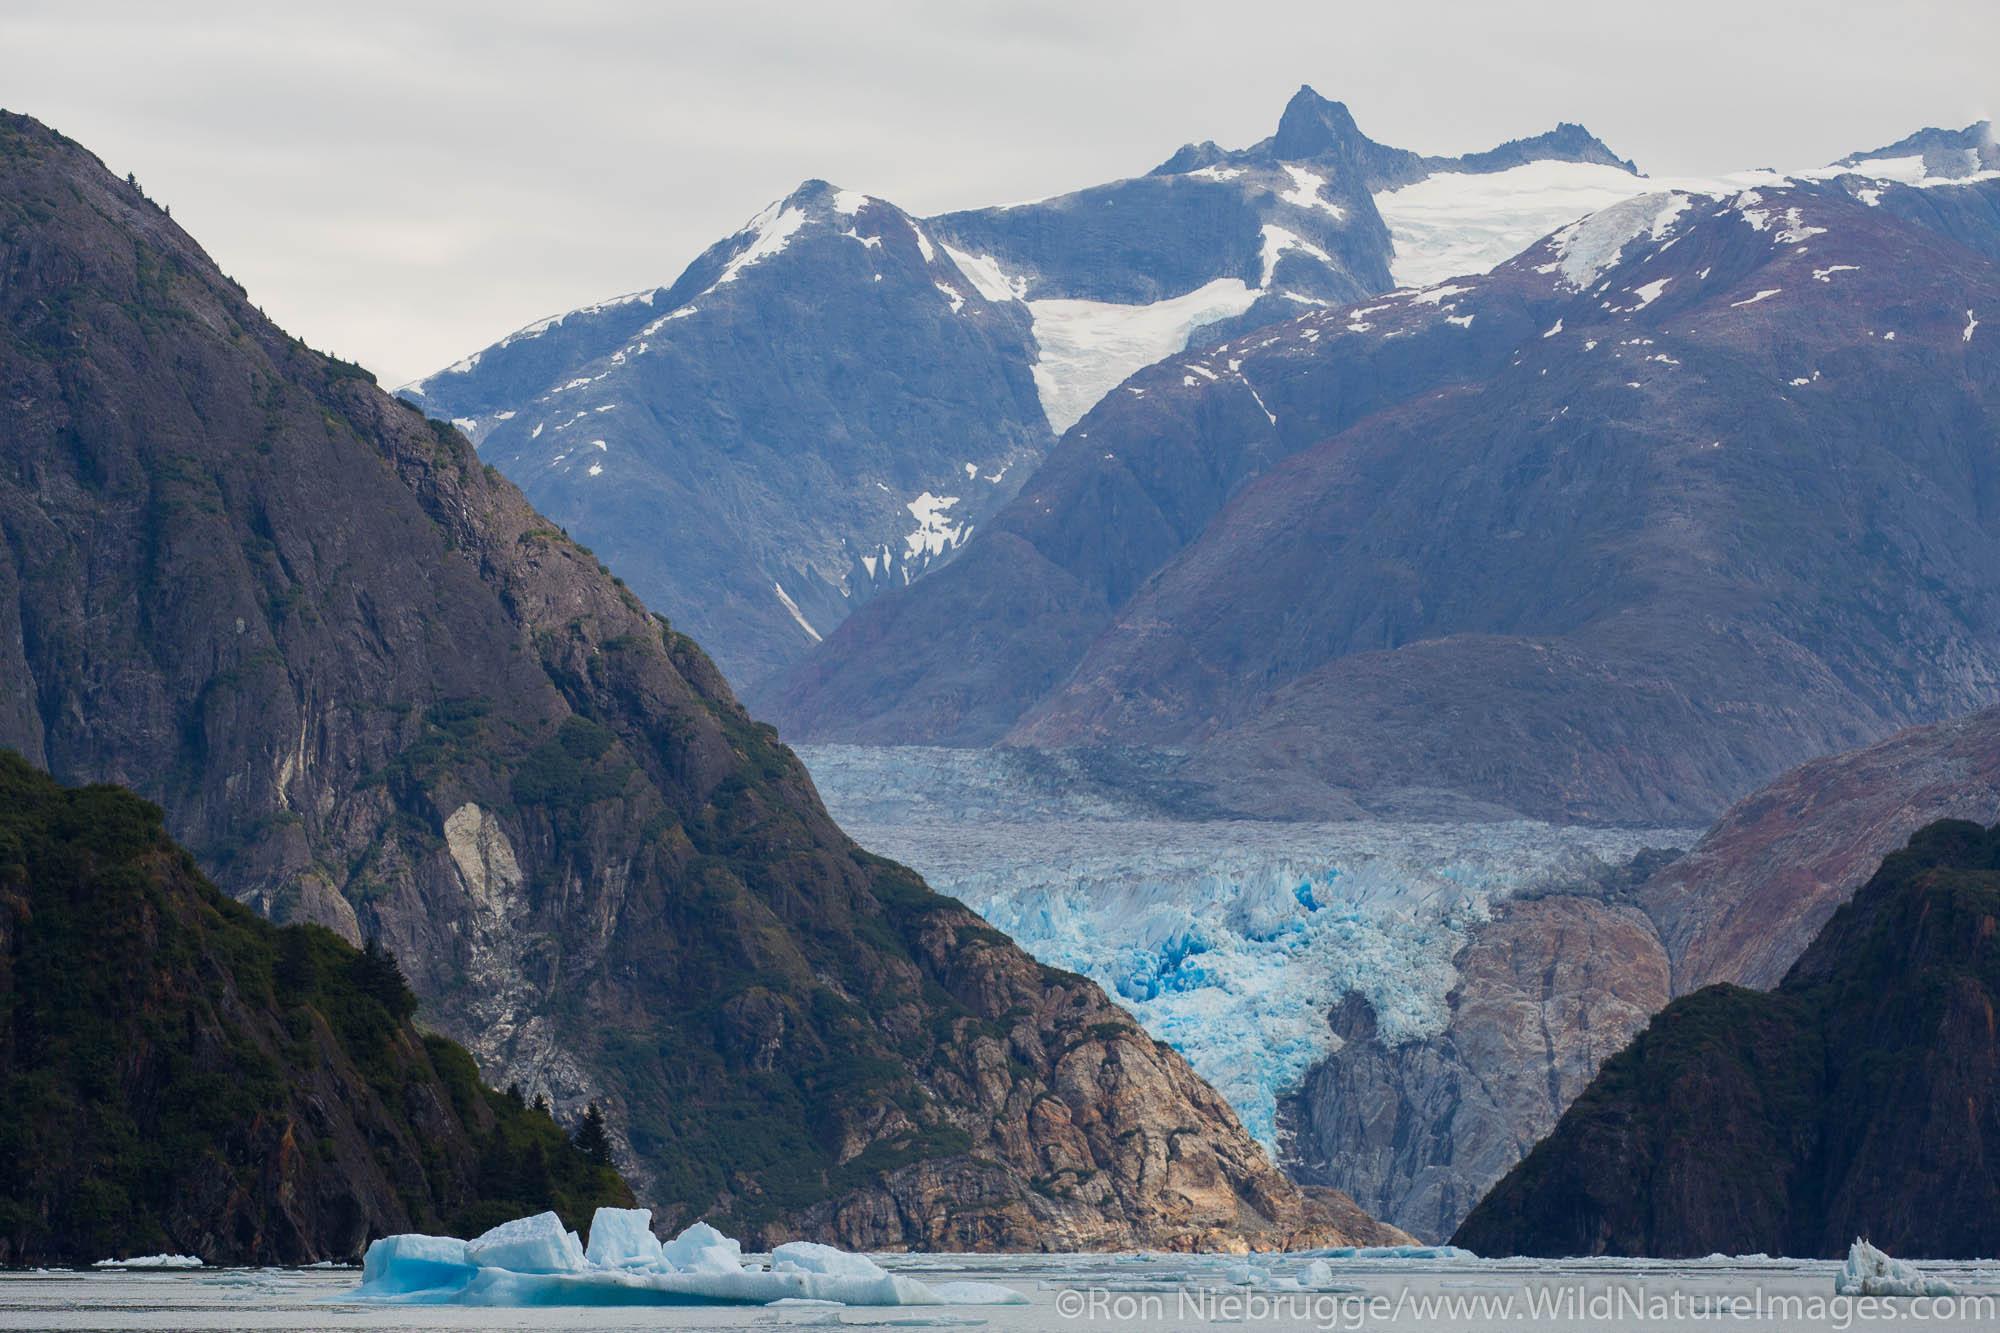 South Sawyer Glacier, Tracy Arm, Tongass National Forest, Alaska.